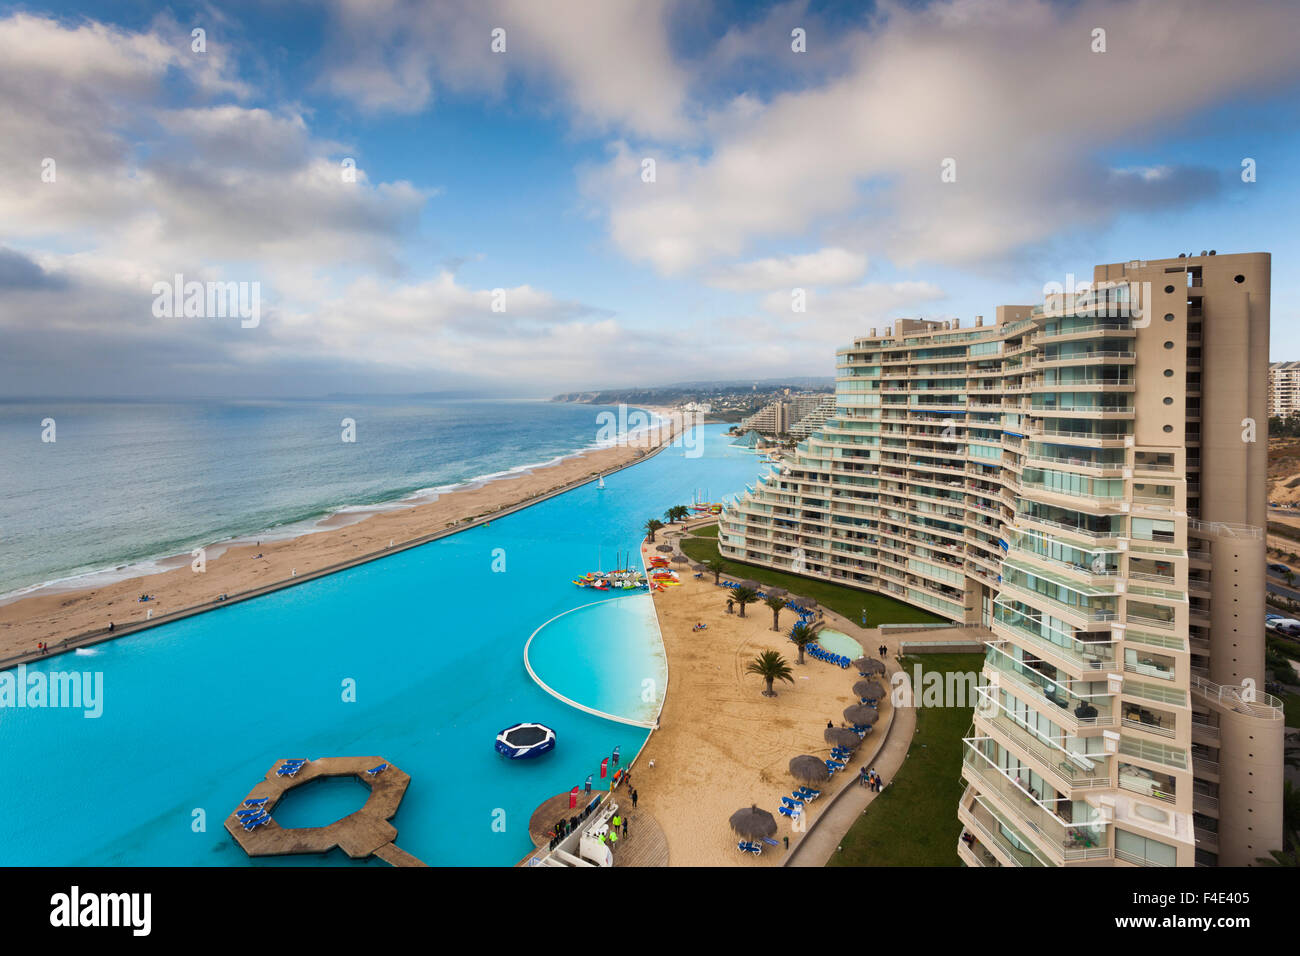 Chile Algarrobo San Alfonso Del Mar Resort Has The World 39 S Largest Stock Photo Royalty Free